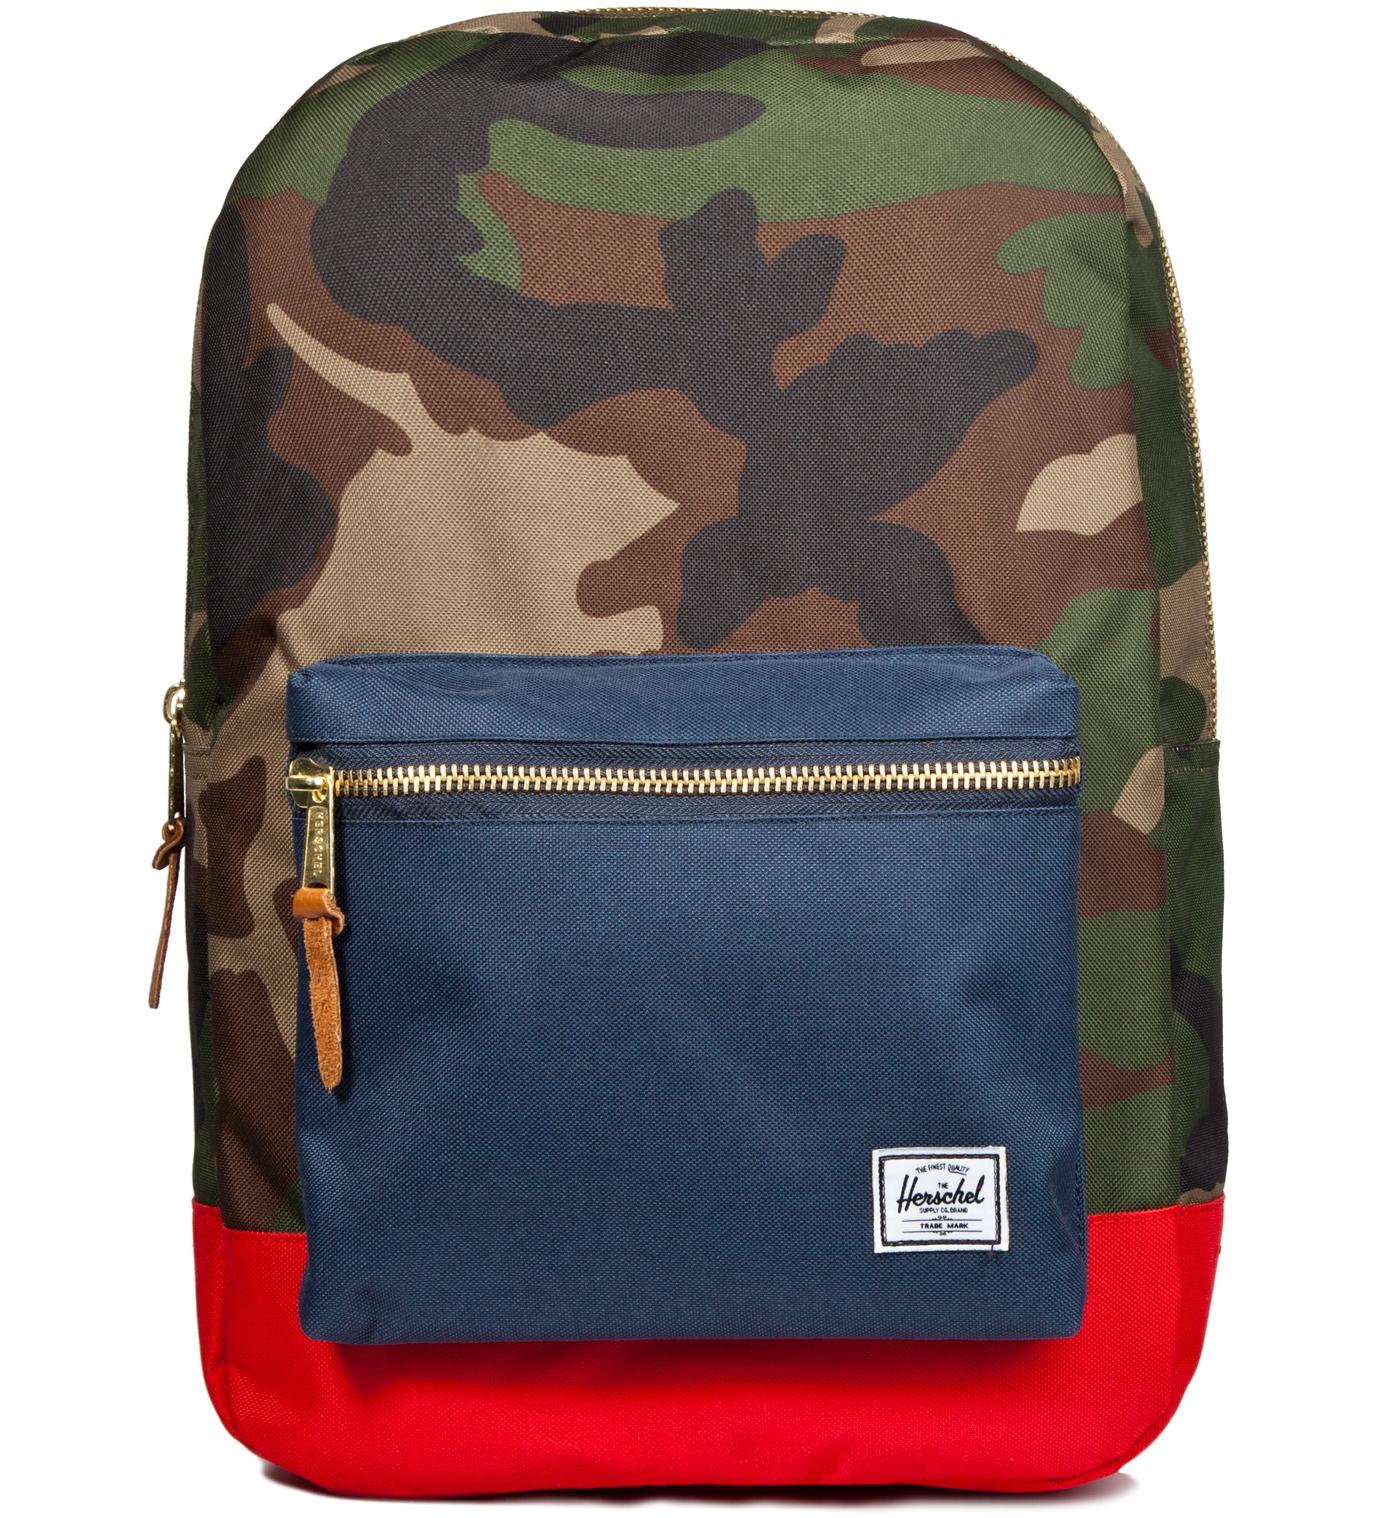 Herschel Supply Co. Woodland Camo/Navy/Red Settlement Backpack